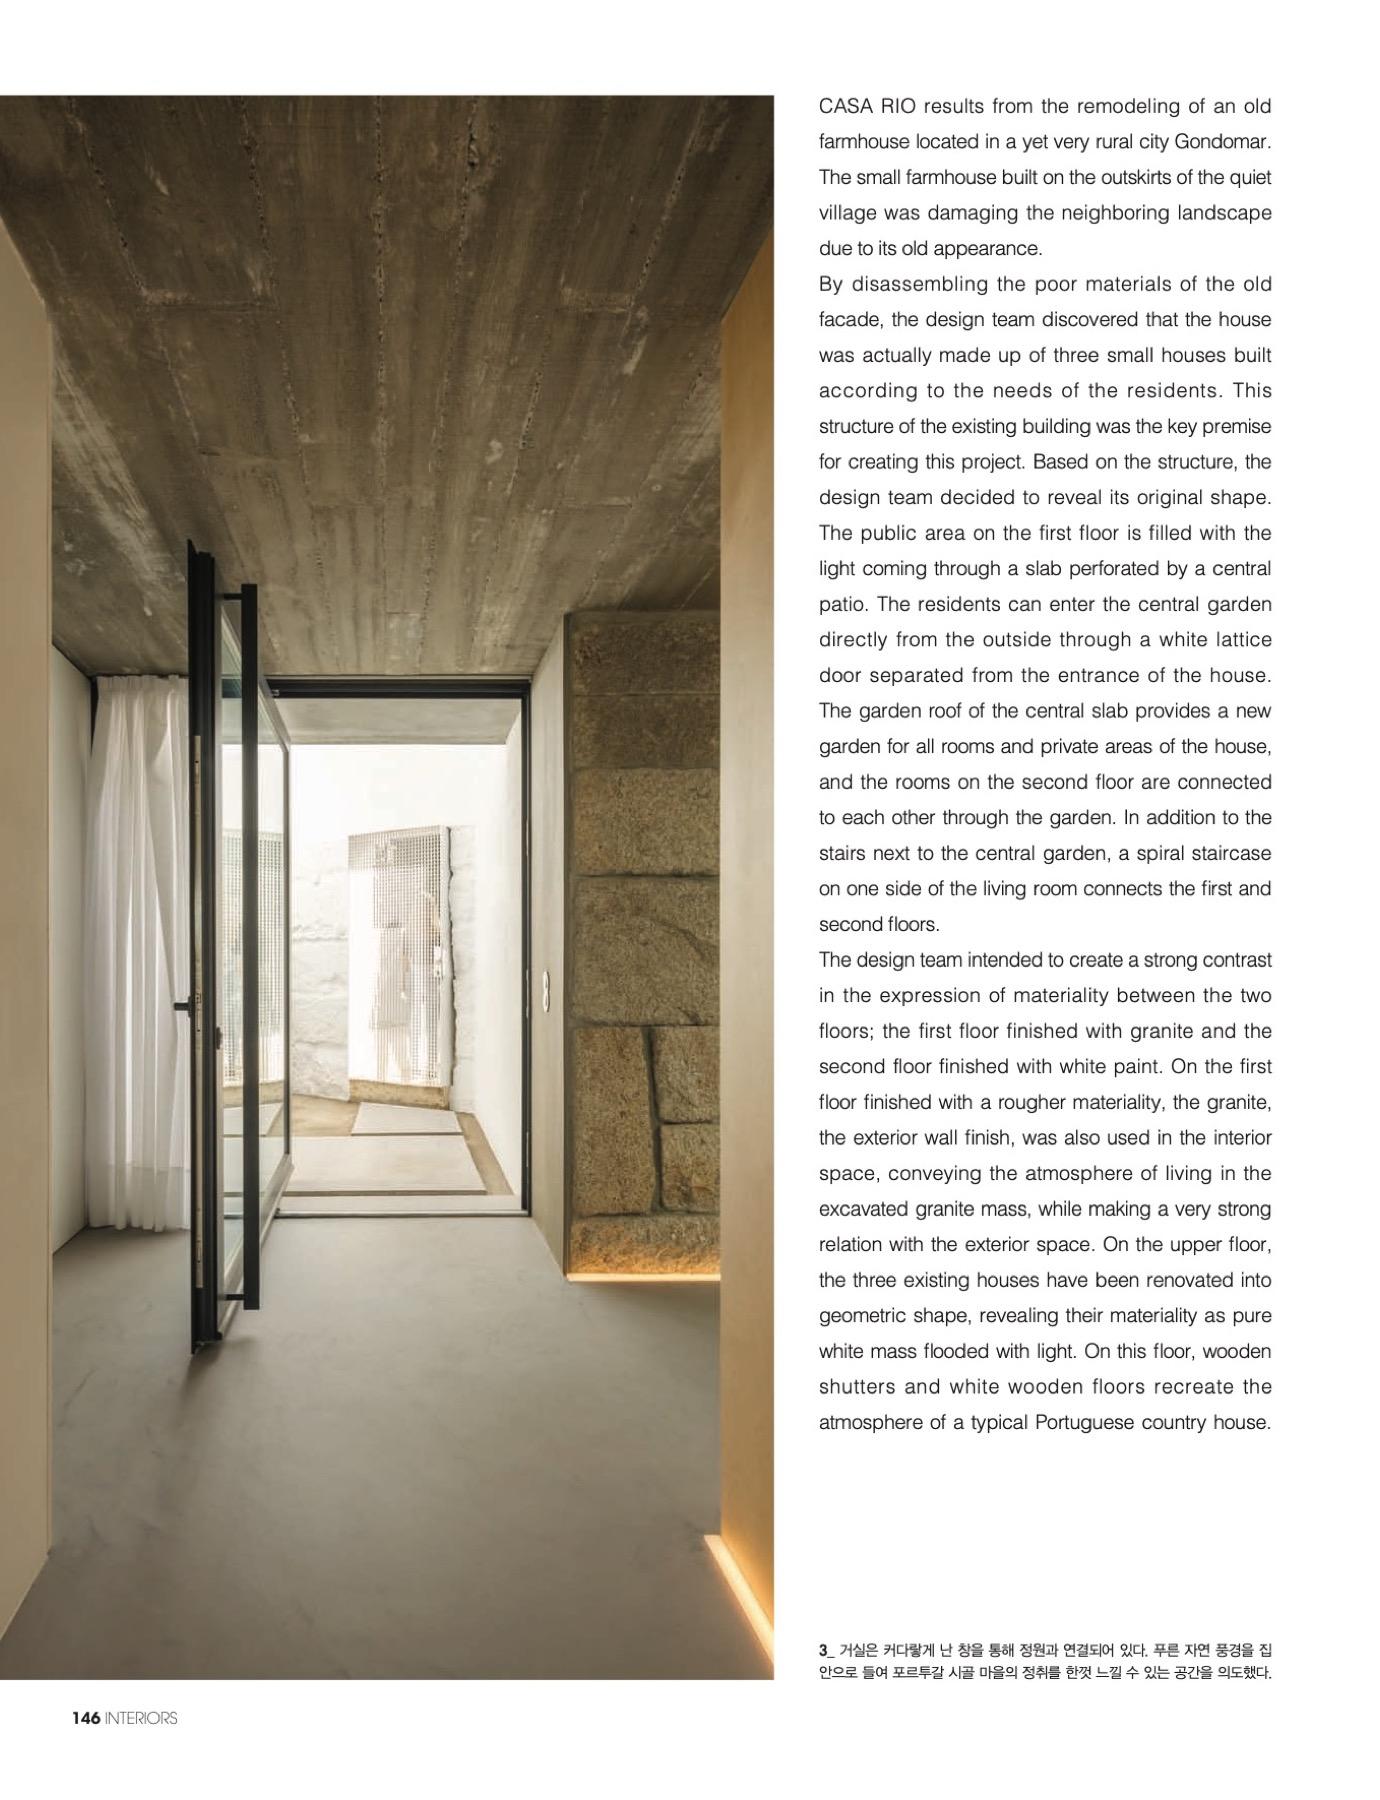 INTERIORS KOREA 414 casa rio paulo merlini ivo tavares studio 5 6